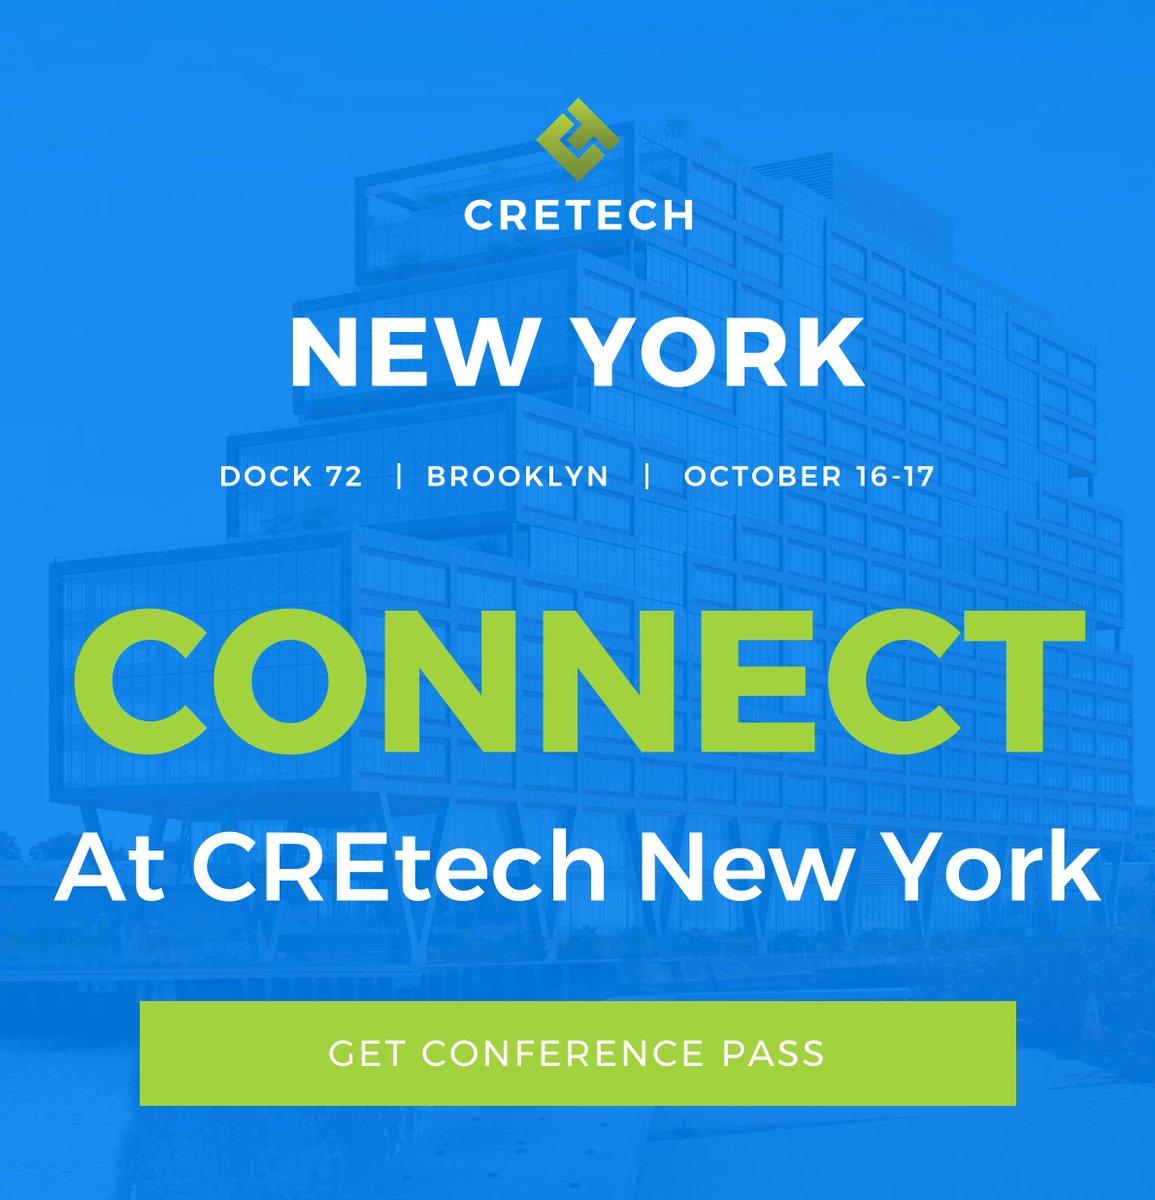 CREtech on Twitter: